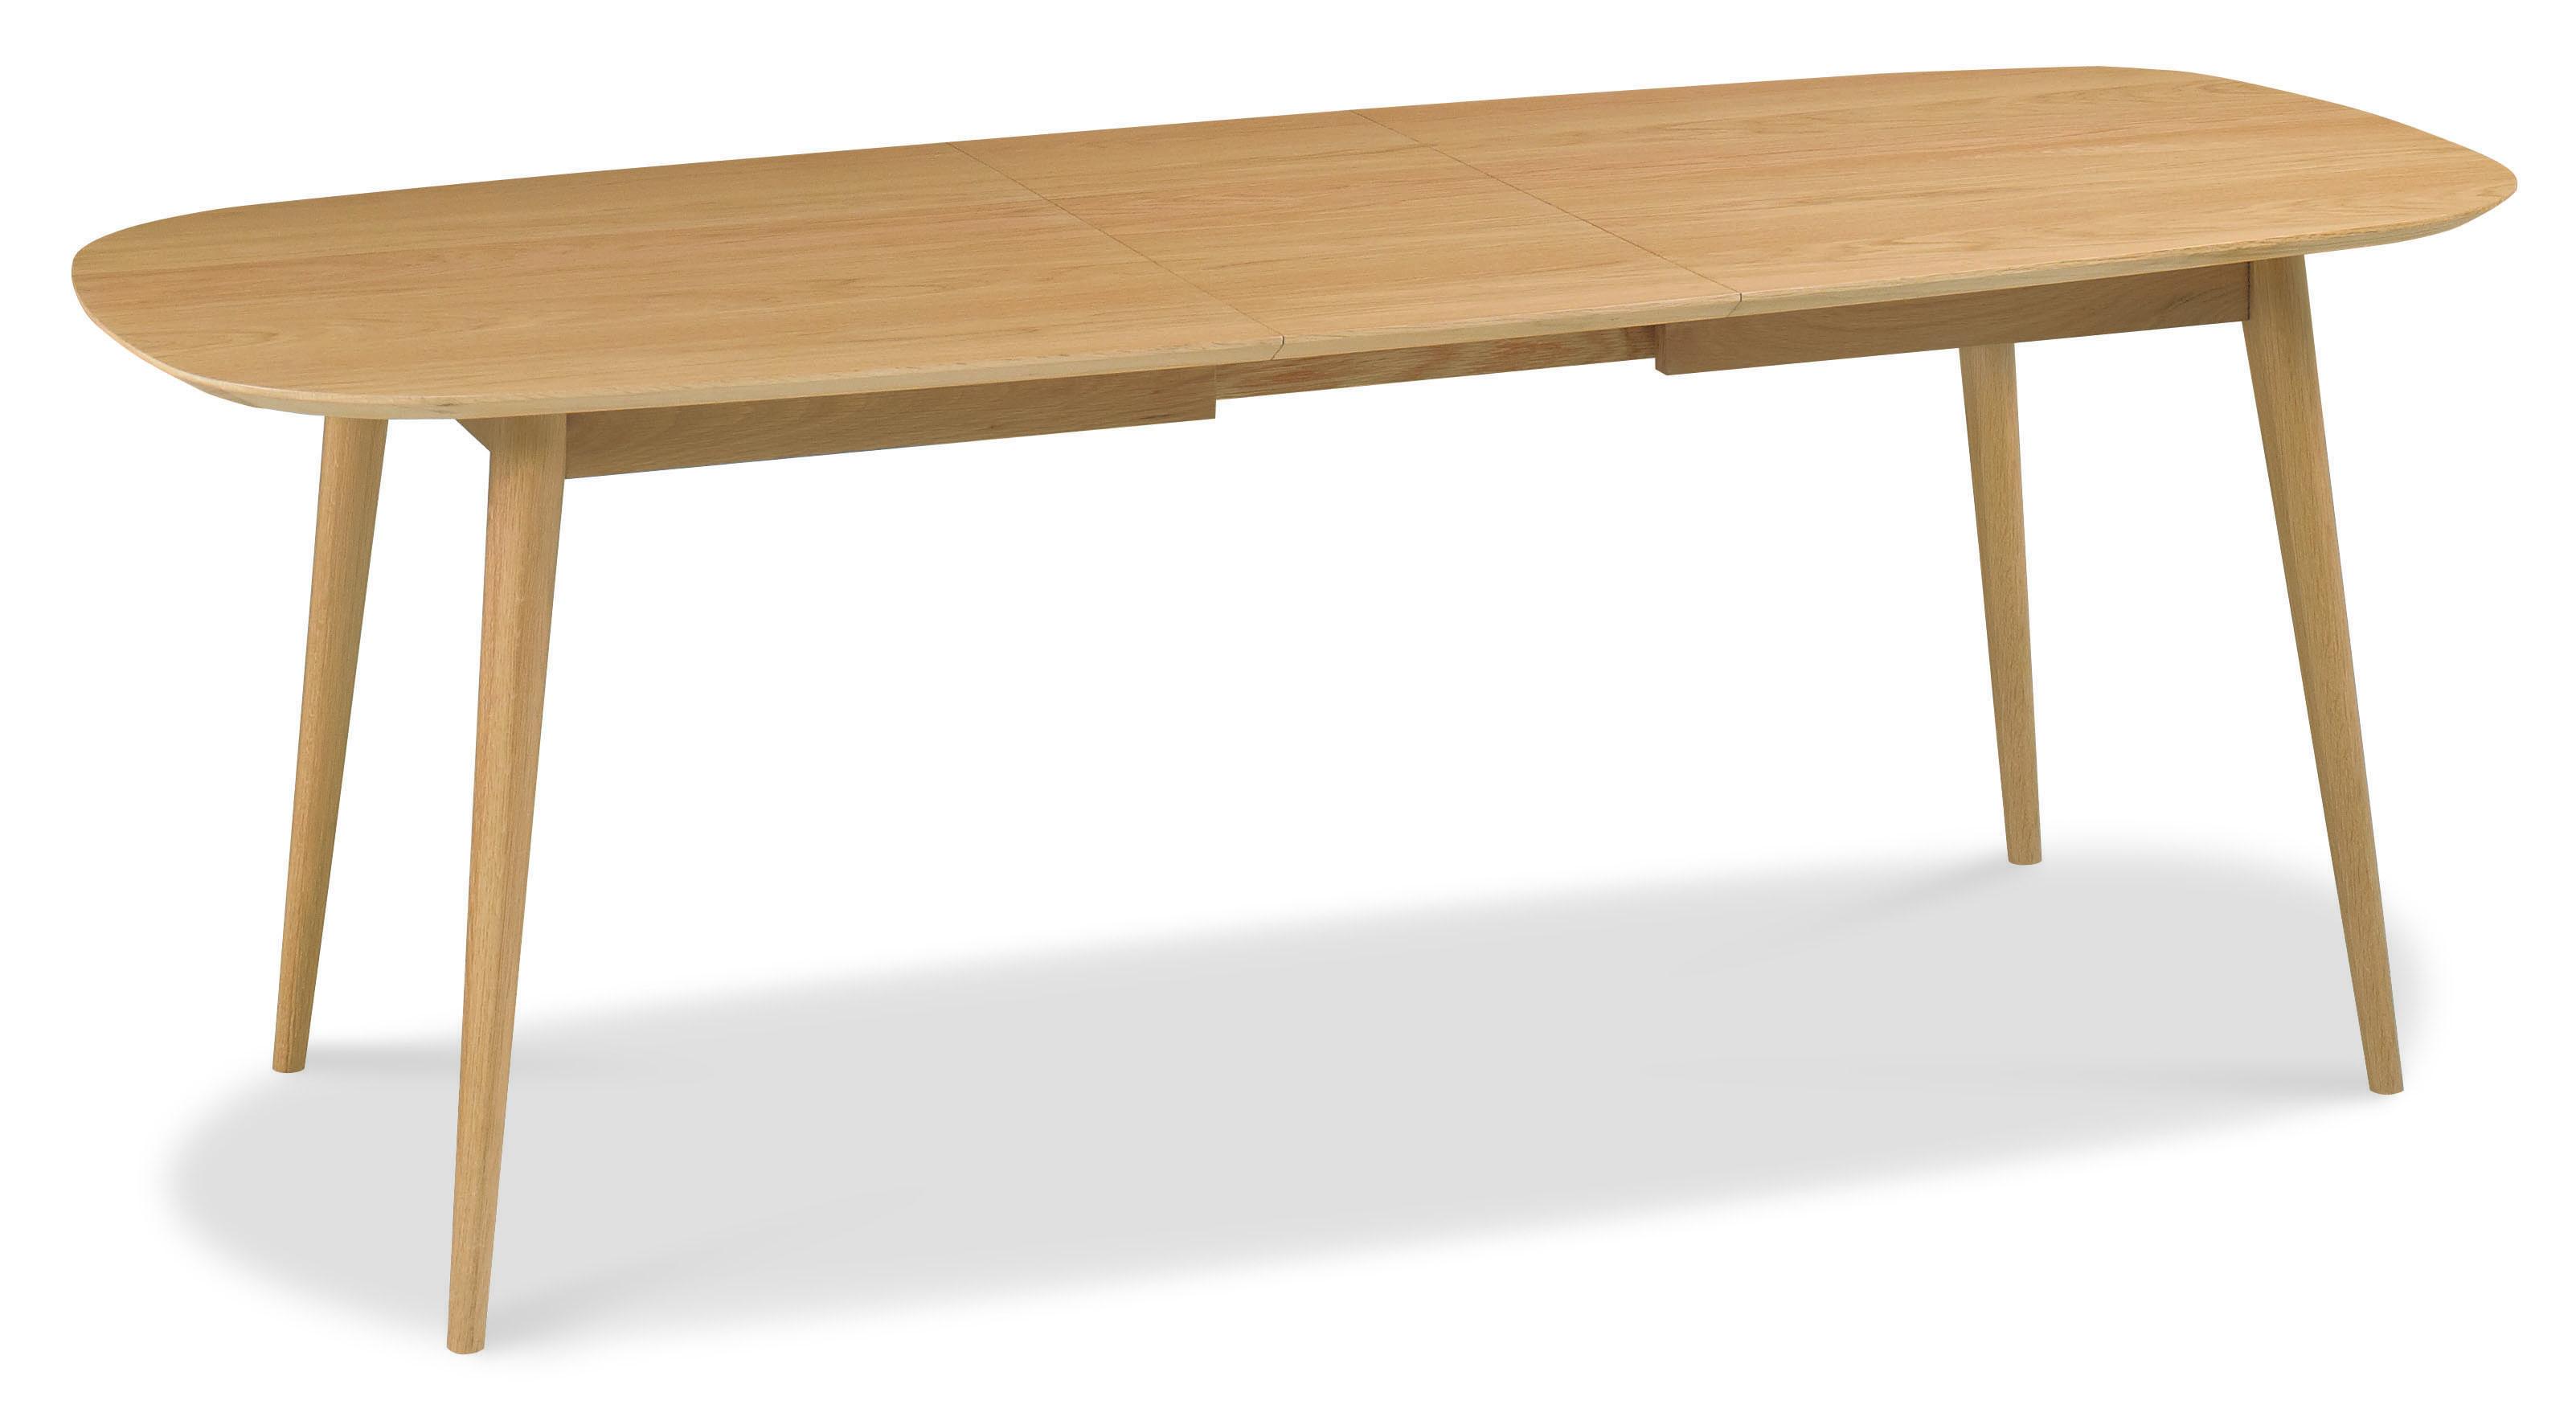 Oslo Oak Extending 6-8 Seater Dining Table